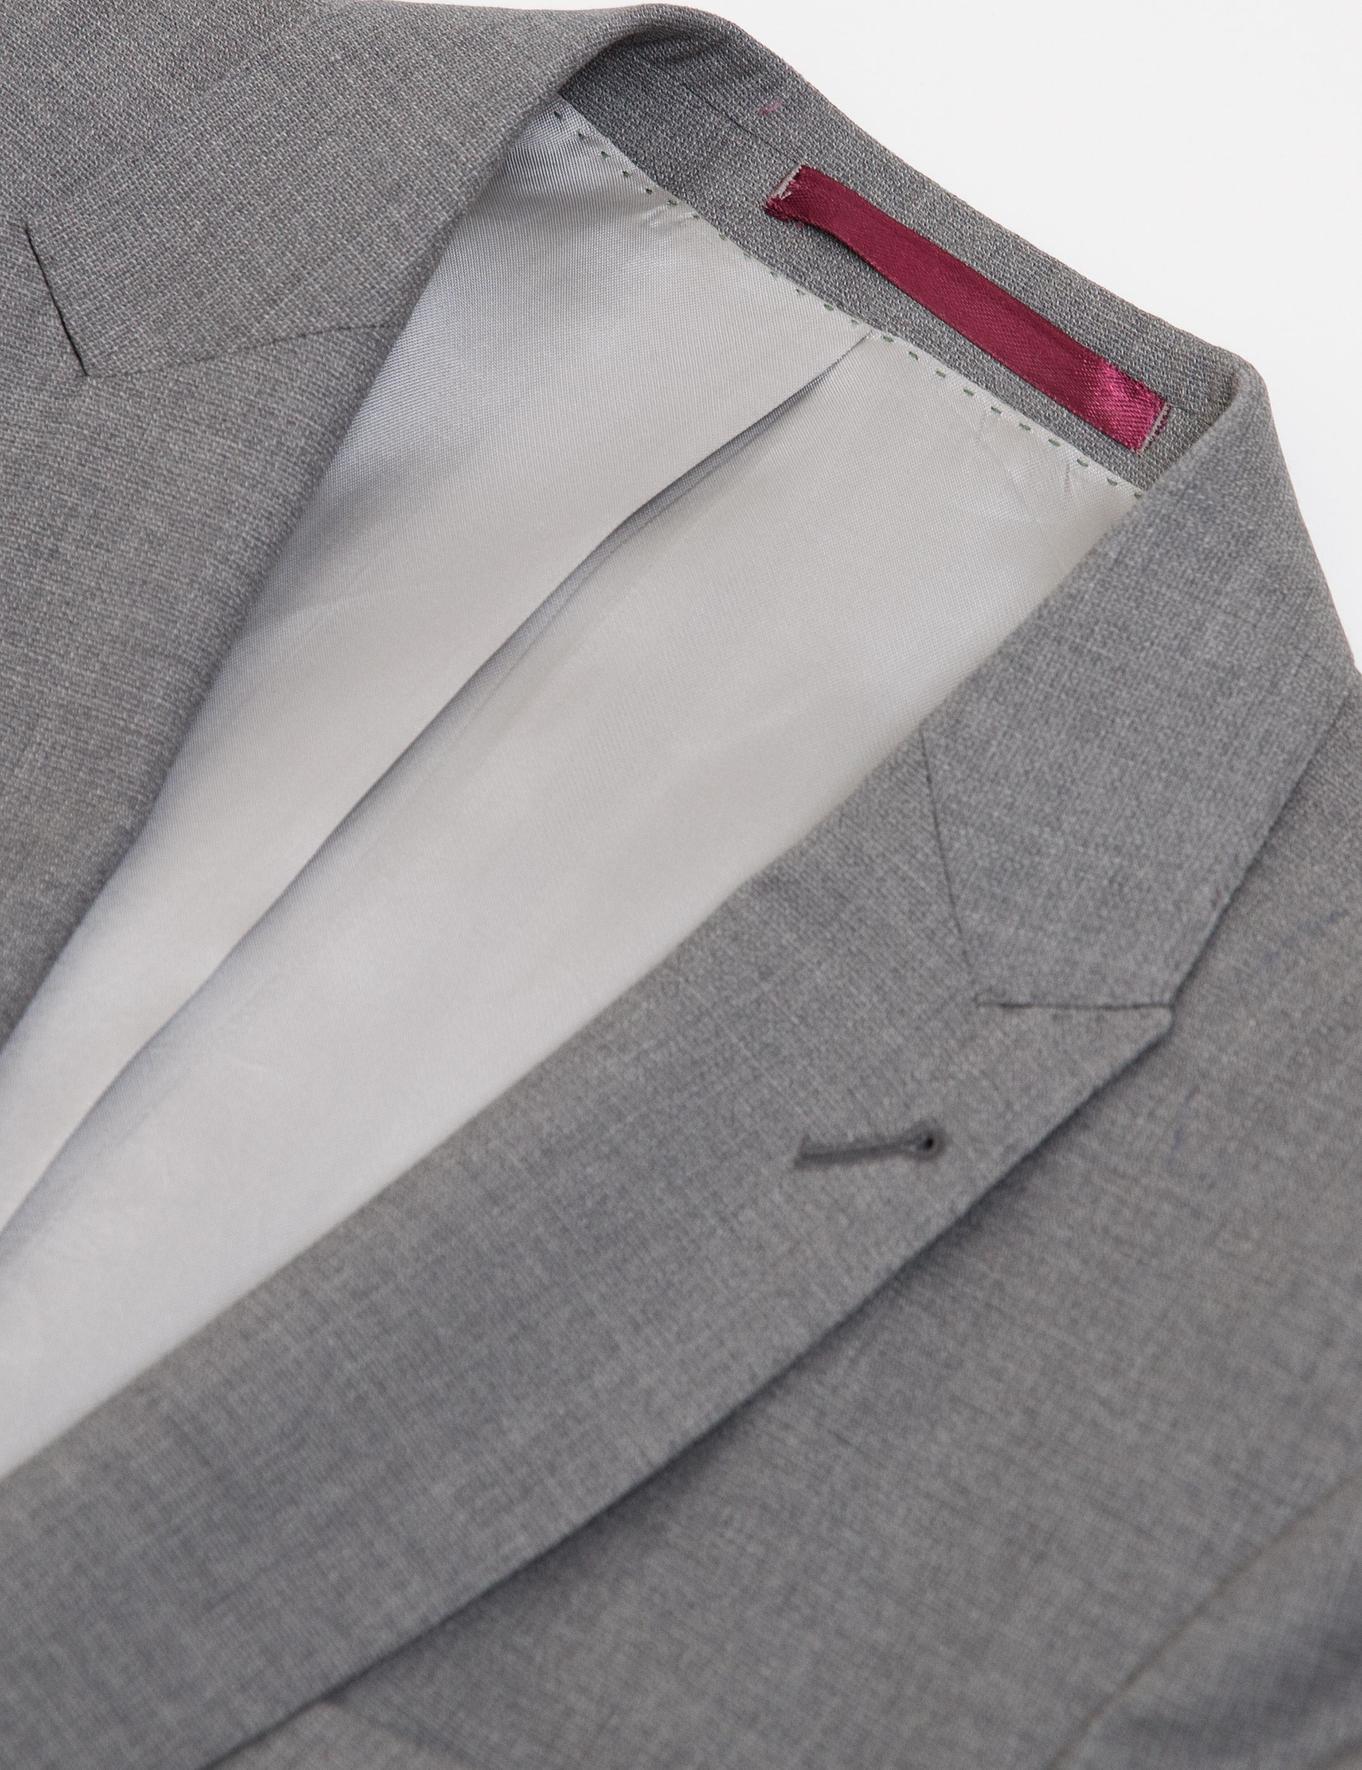 Gri Slim Fit Ceket - 50185736002